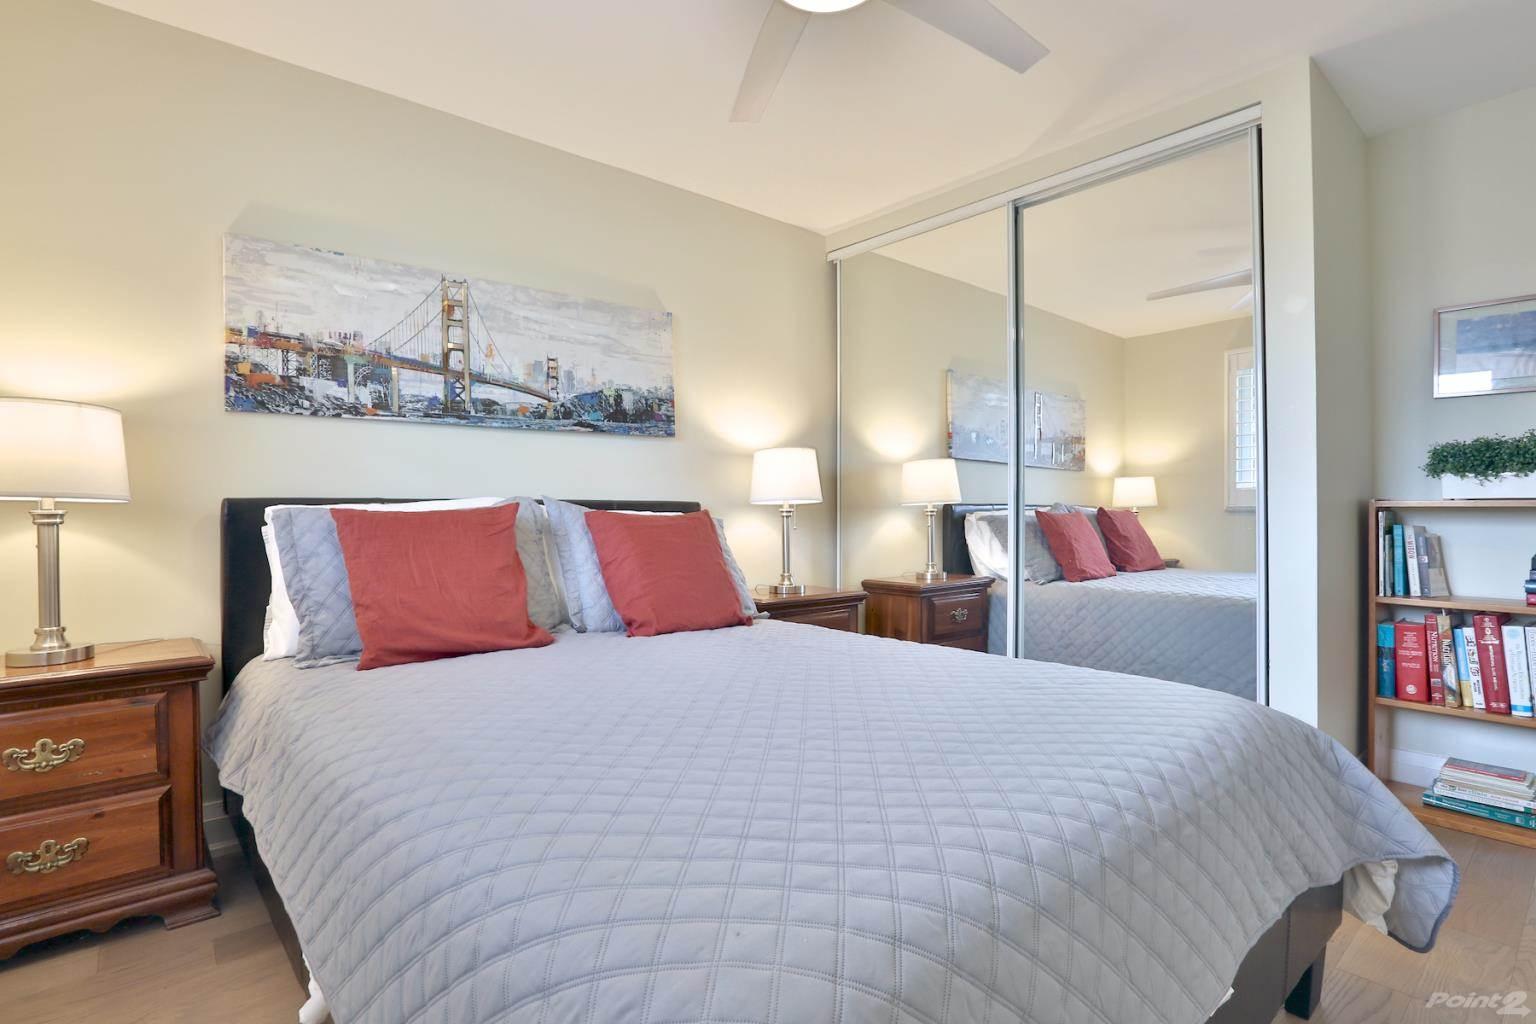 43 Ashglen Way, Markham House For Sale